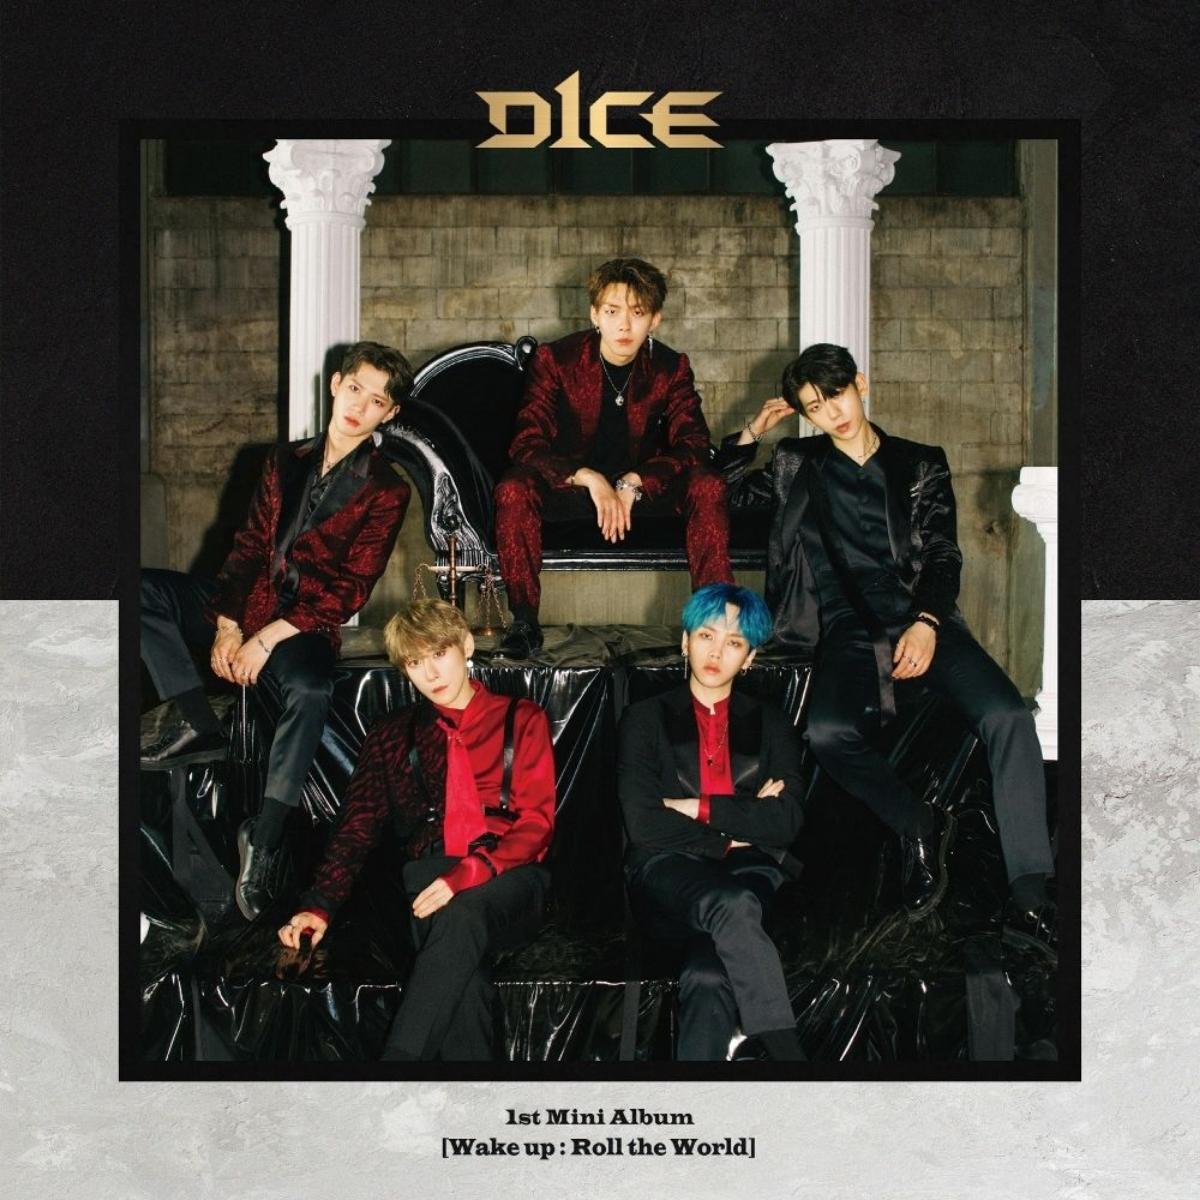 Download Full Album Heartbeat Bts World K-Pop Music MP3 Songs